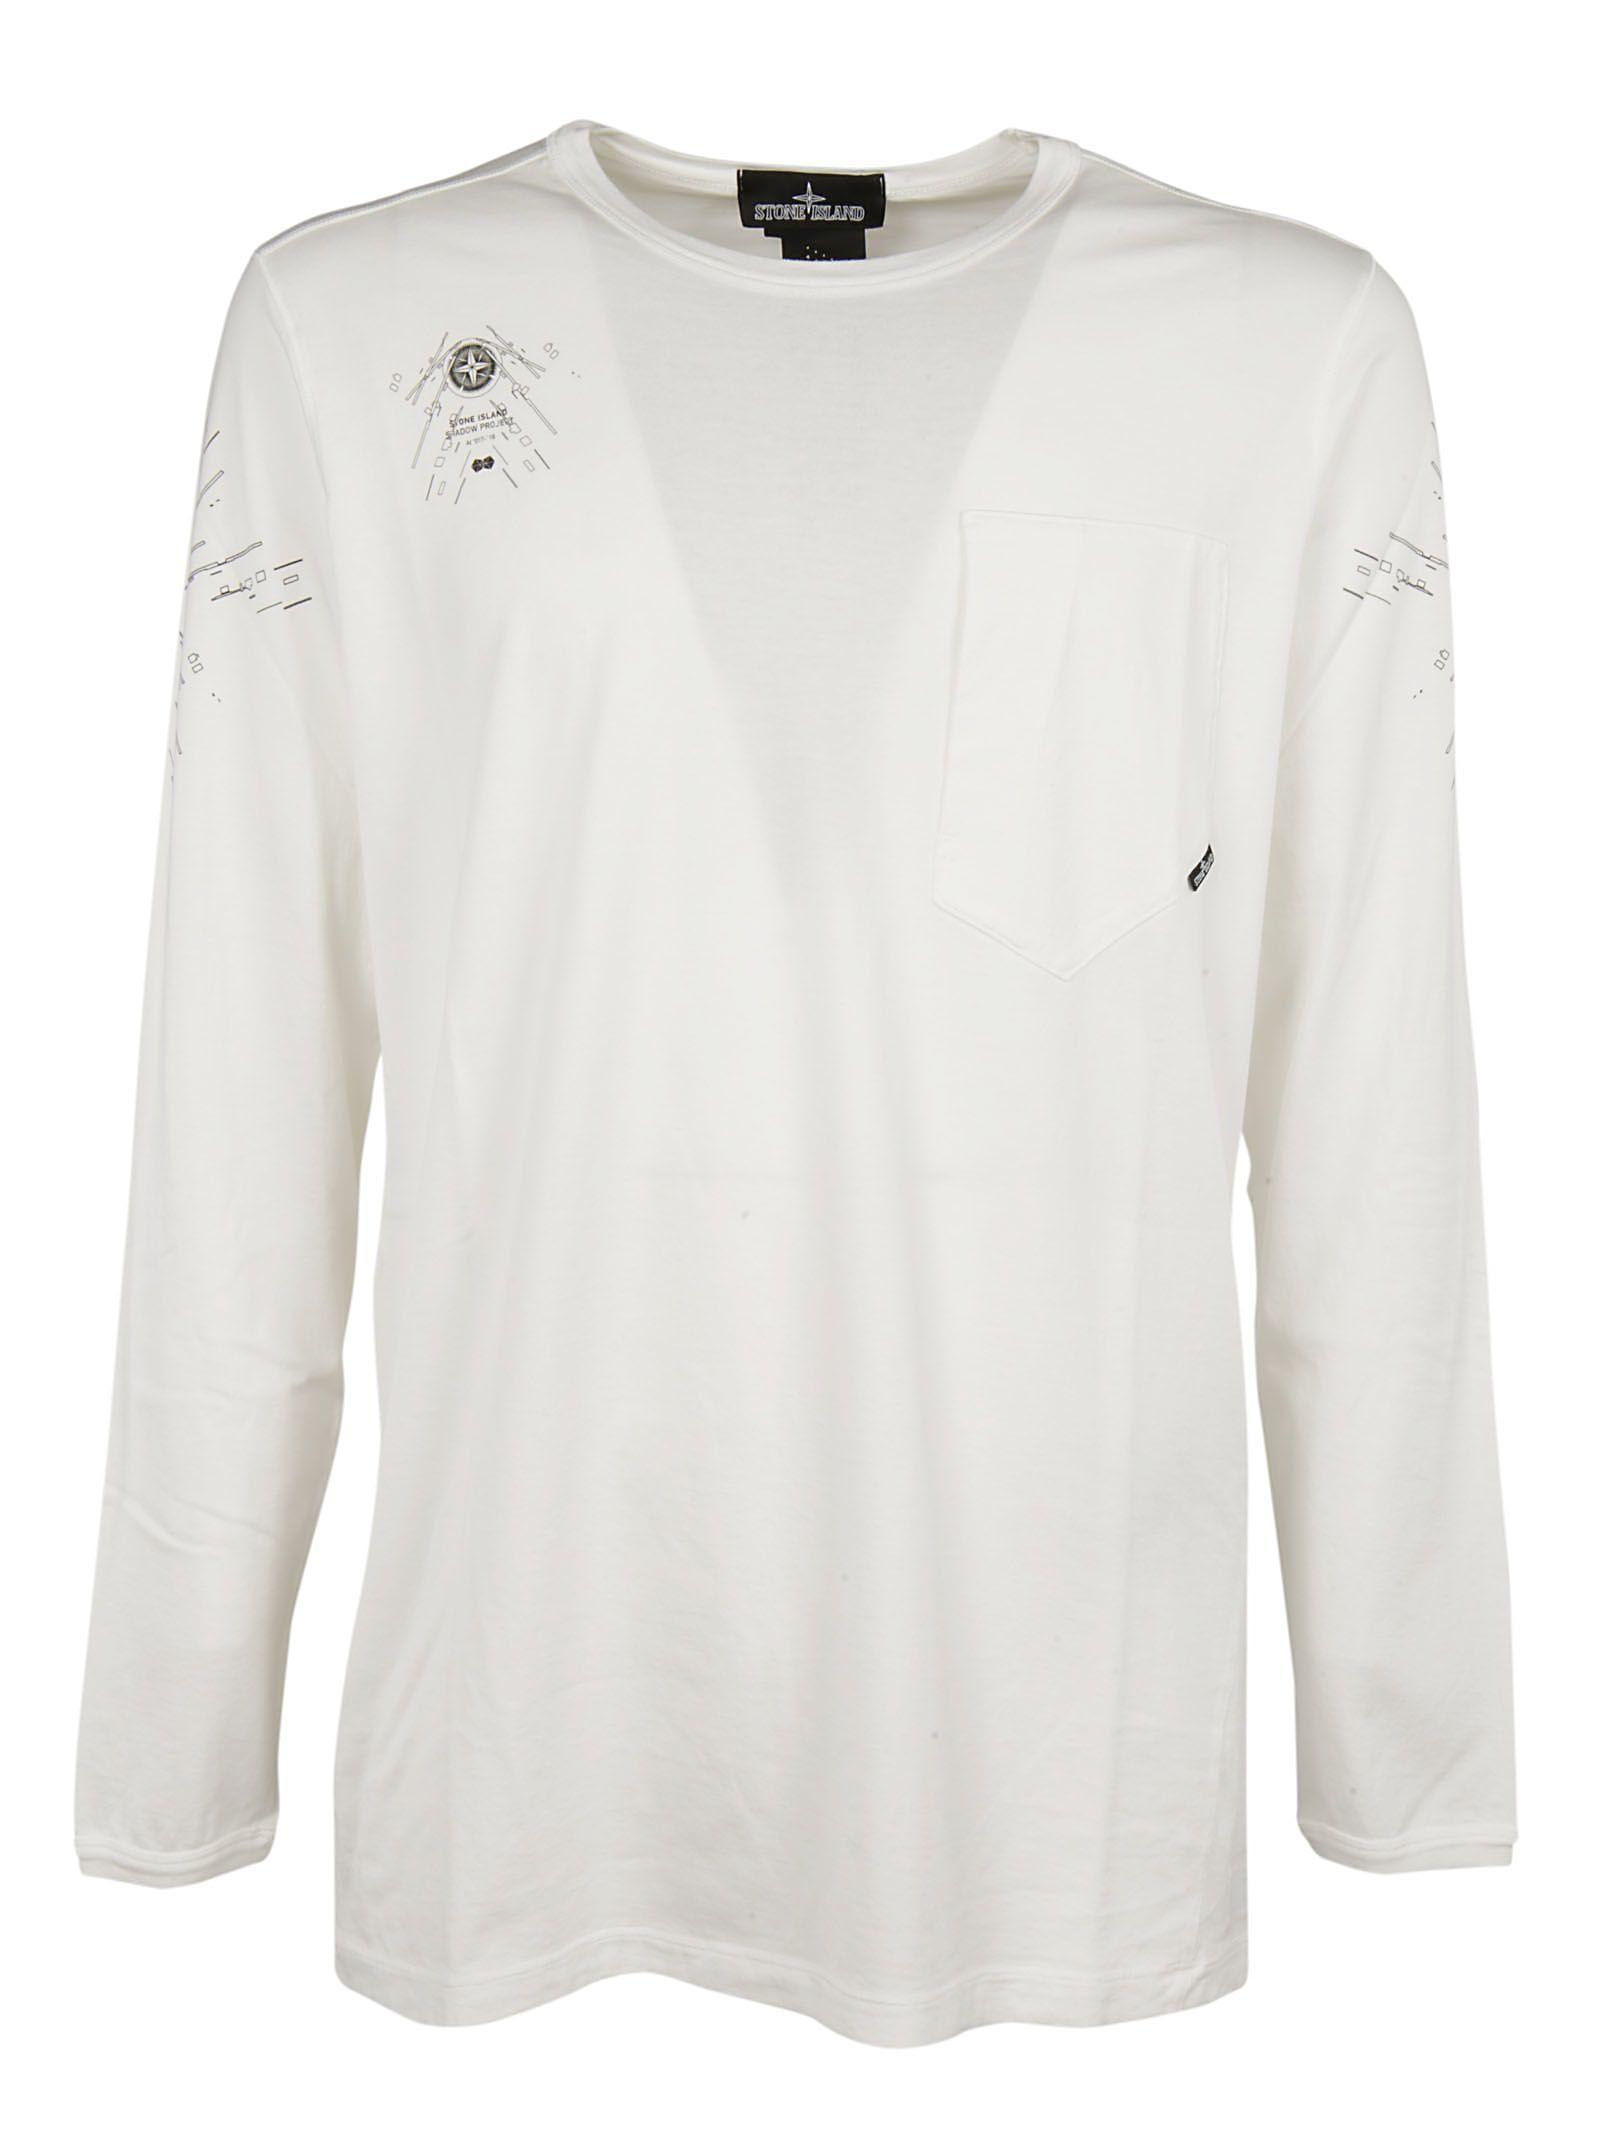 Stone Island Shadow Garment Dyed Sweatshirt In White